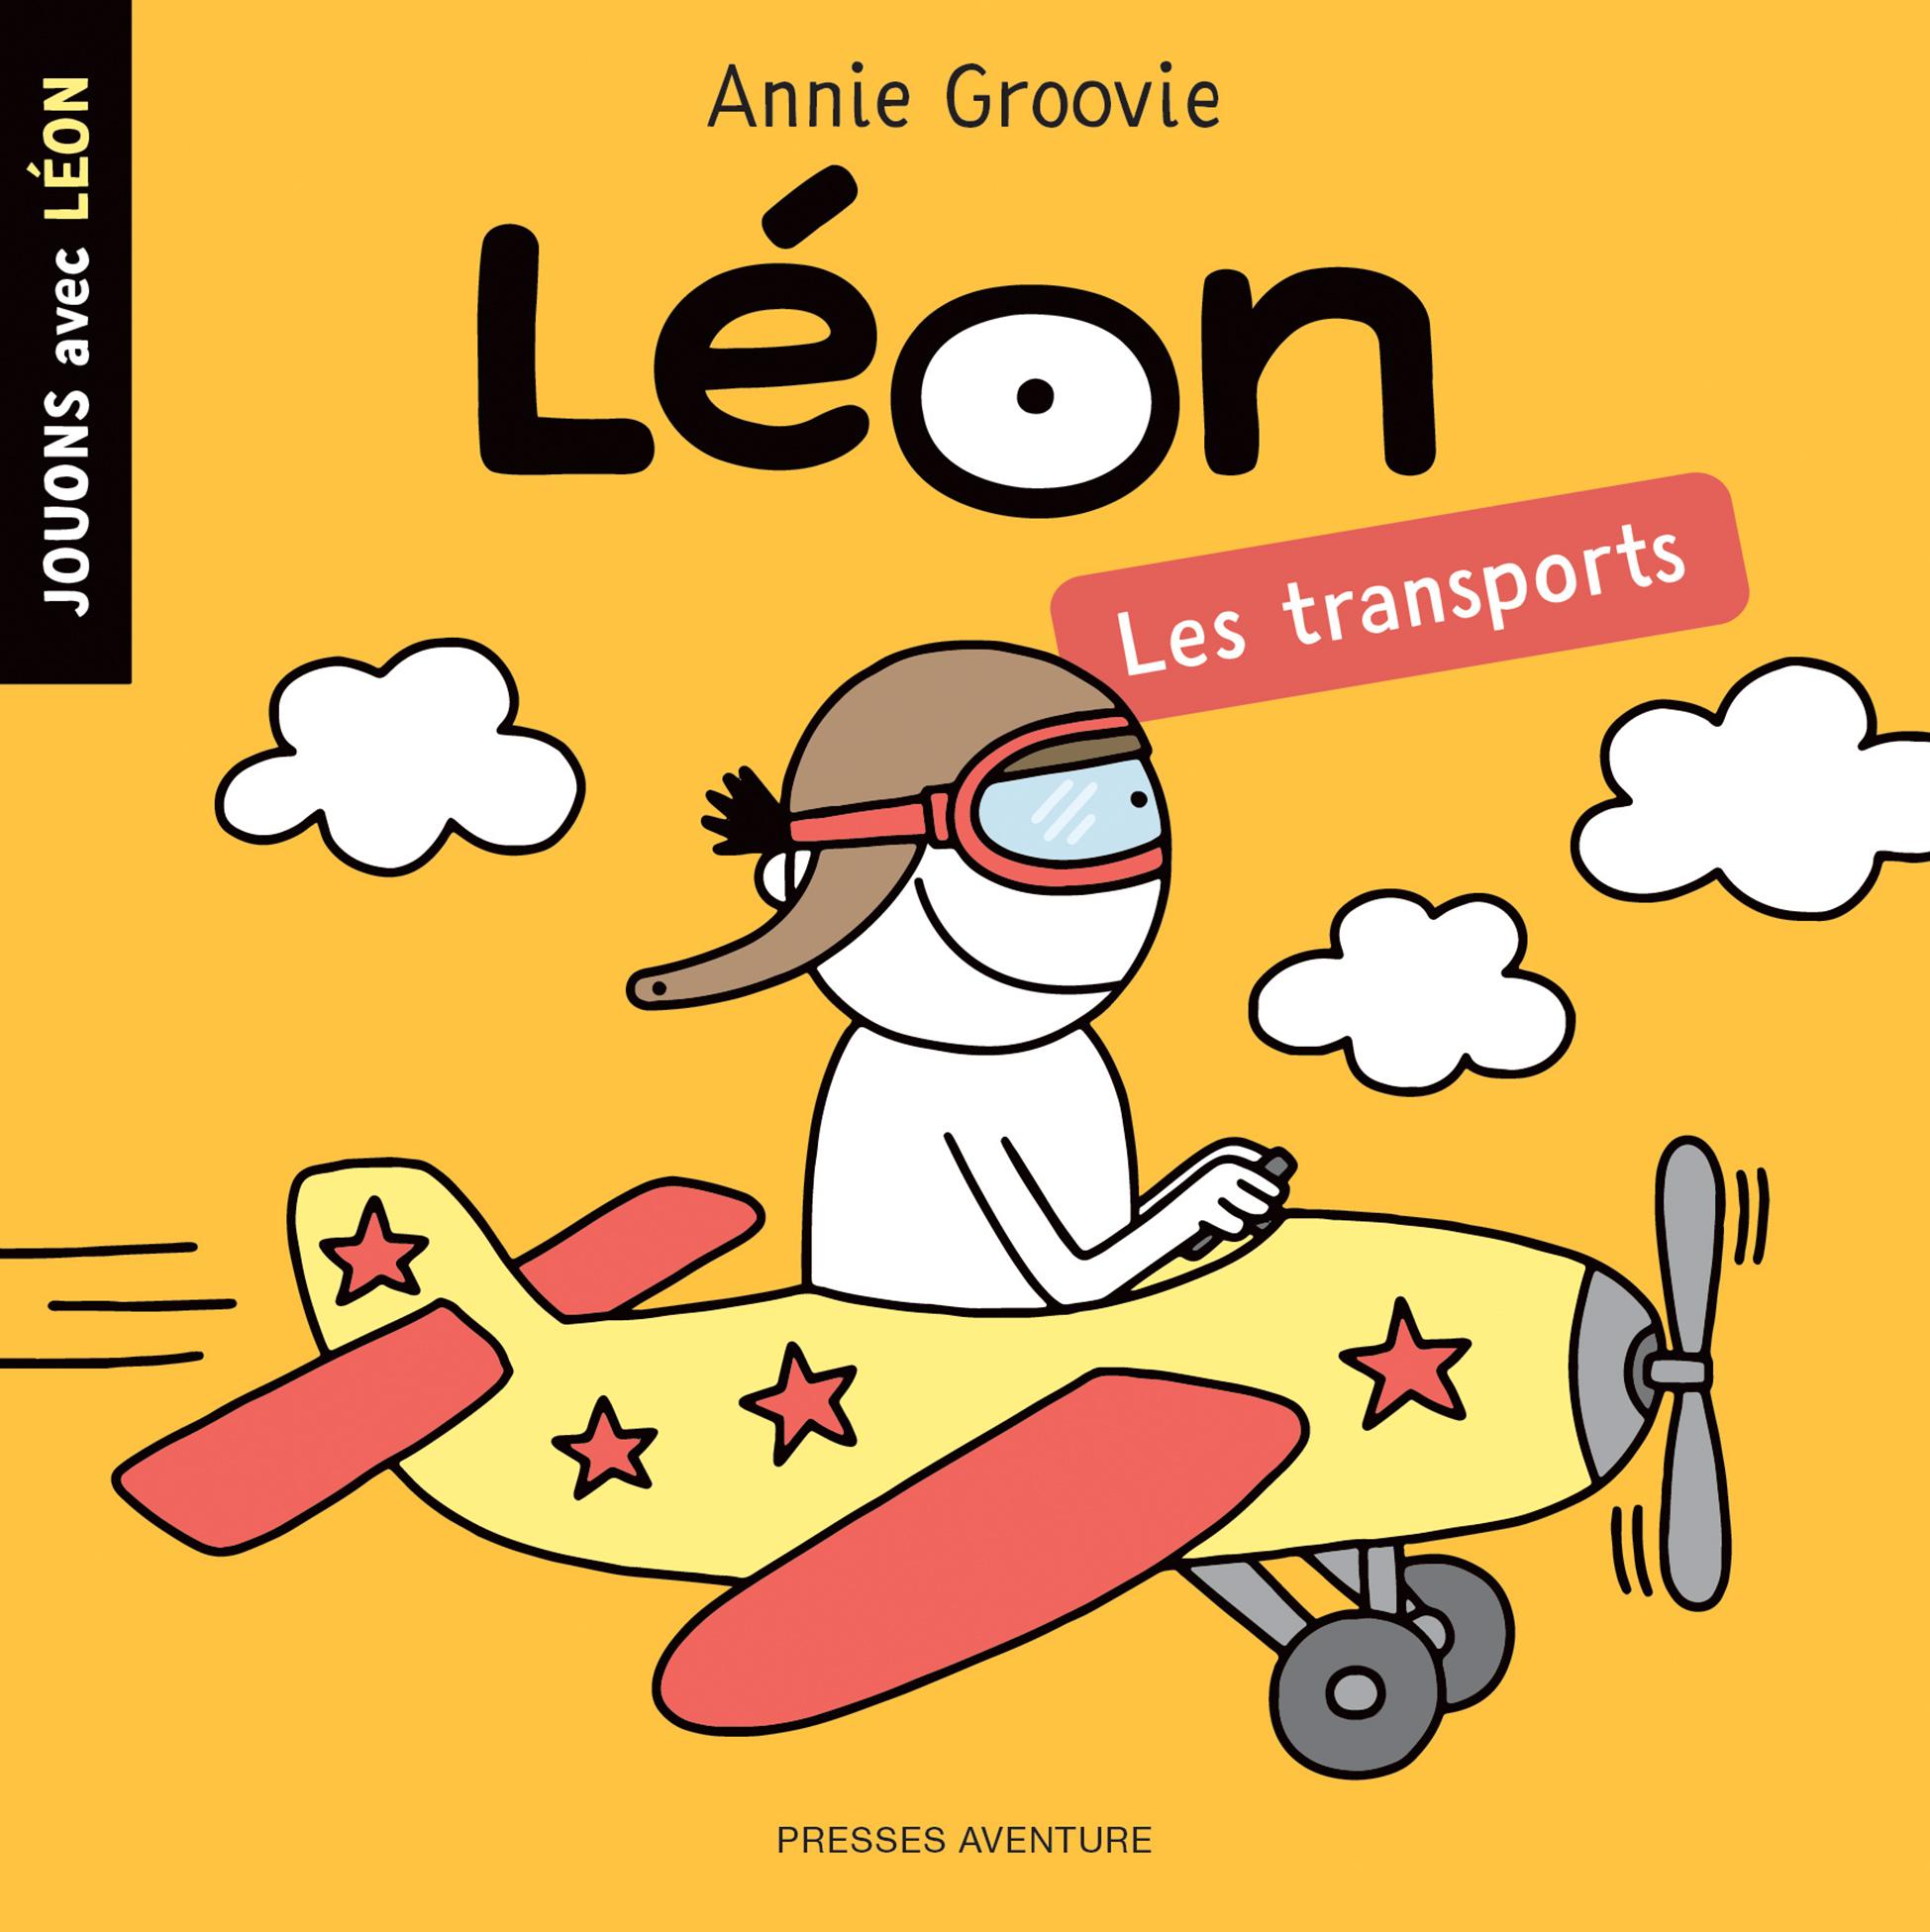 523_LeonTransports_C1